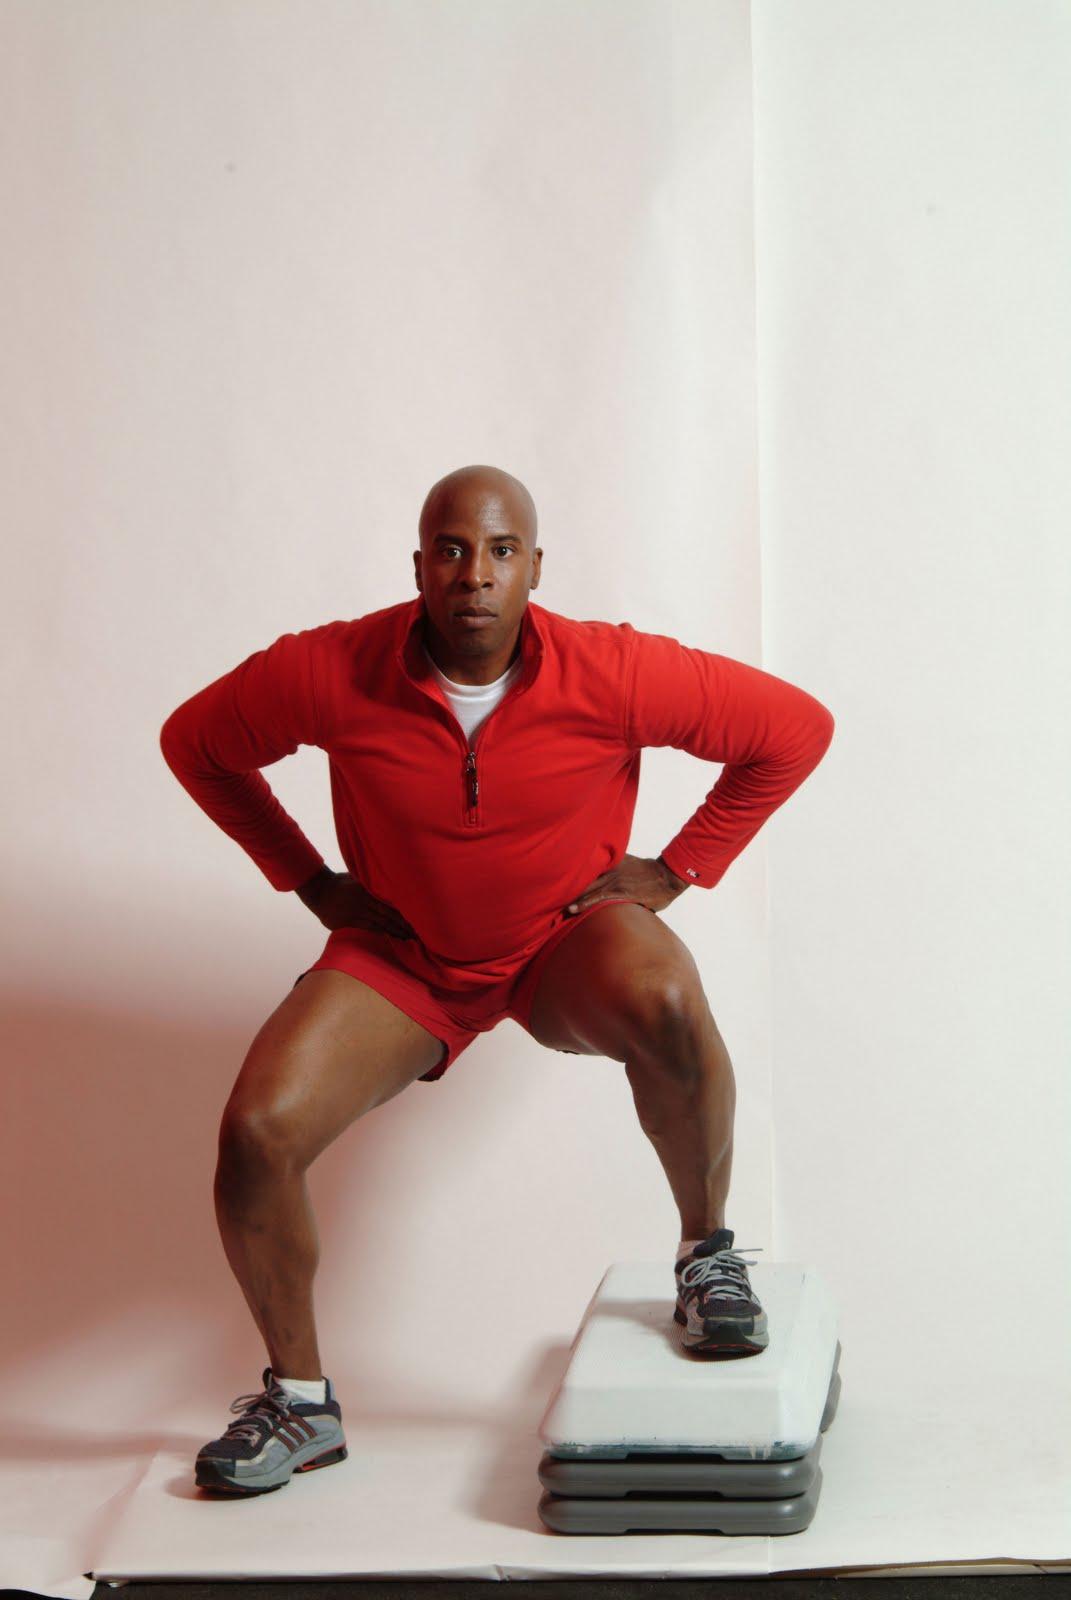 E Form Workout: E-Form Workout-Leg Exercises  E Form Workout:...